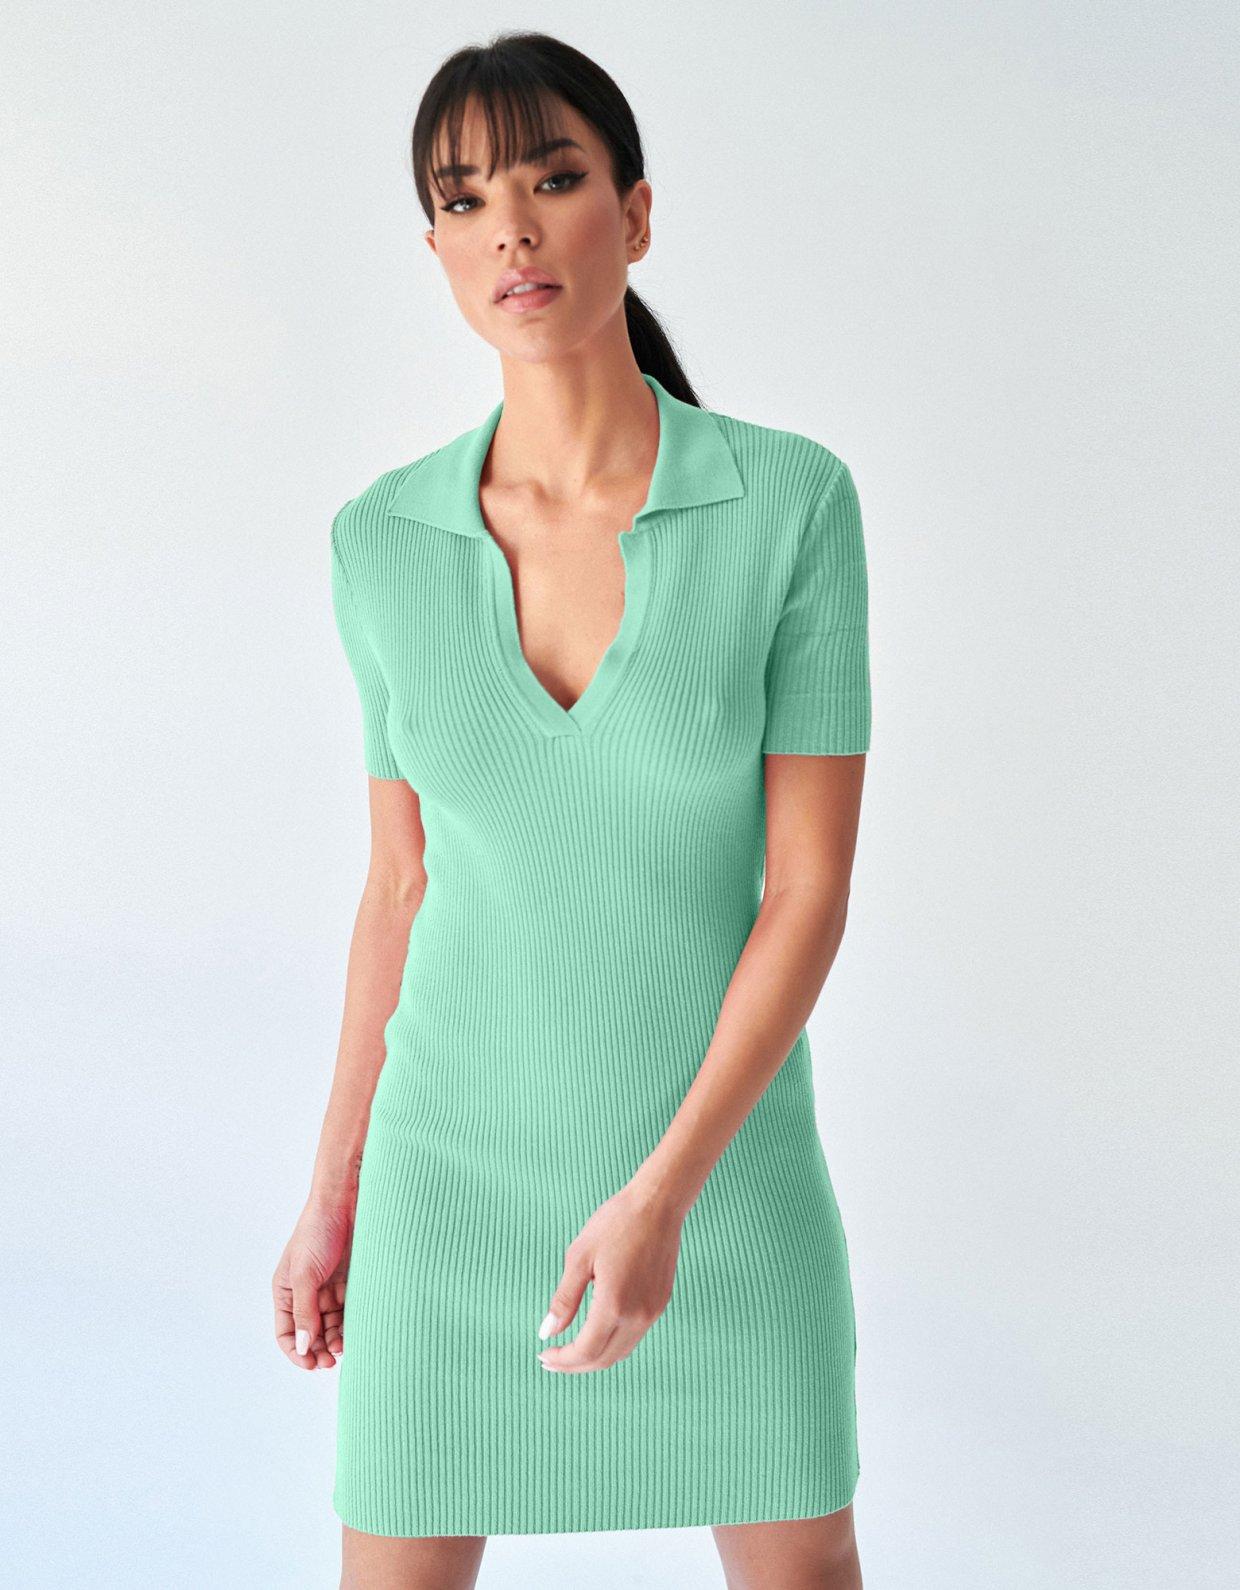 Combos Knitwear Combos S17 – Veraman polo dress